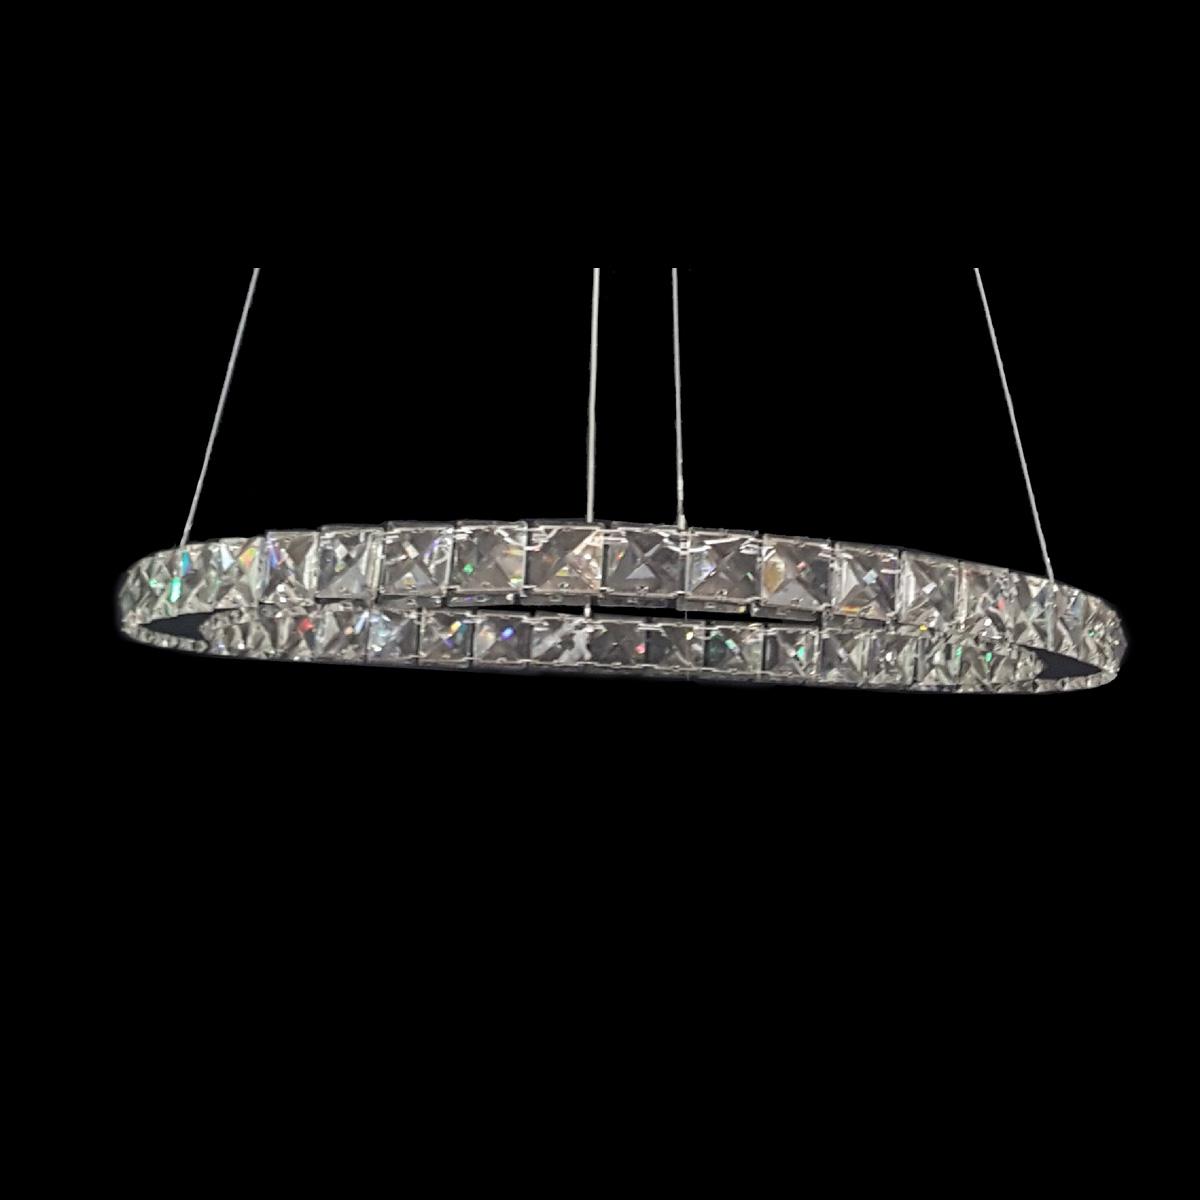 GALAXY 500 Warm White LED Crystal Pendant - LEDP1030WW